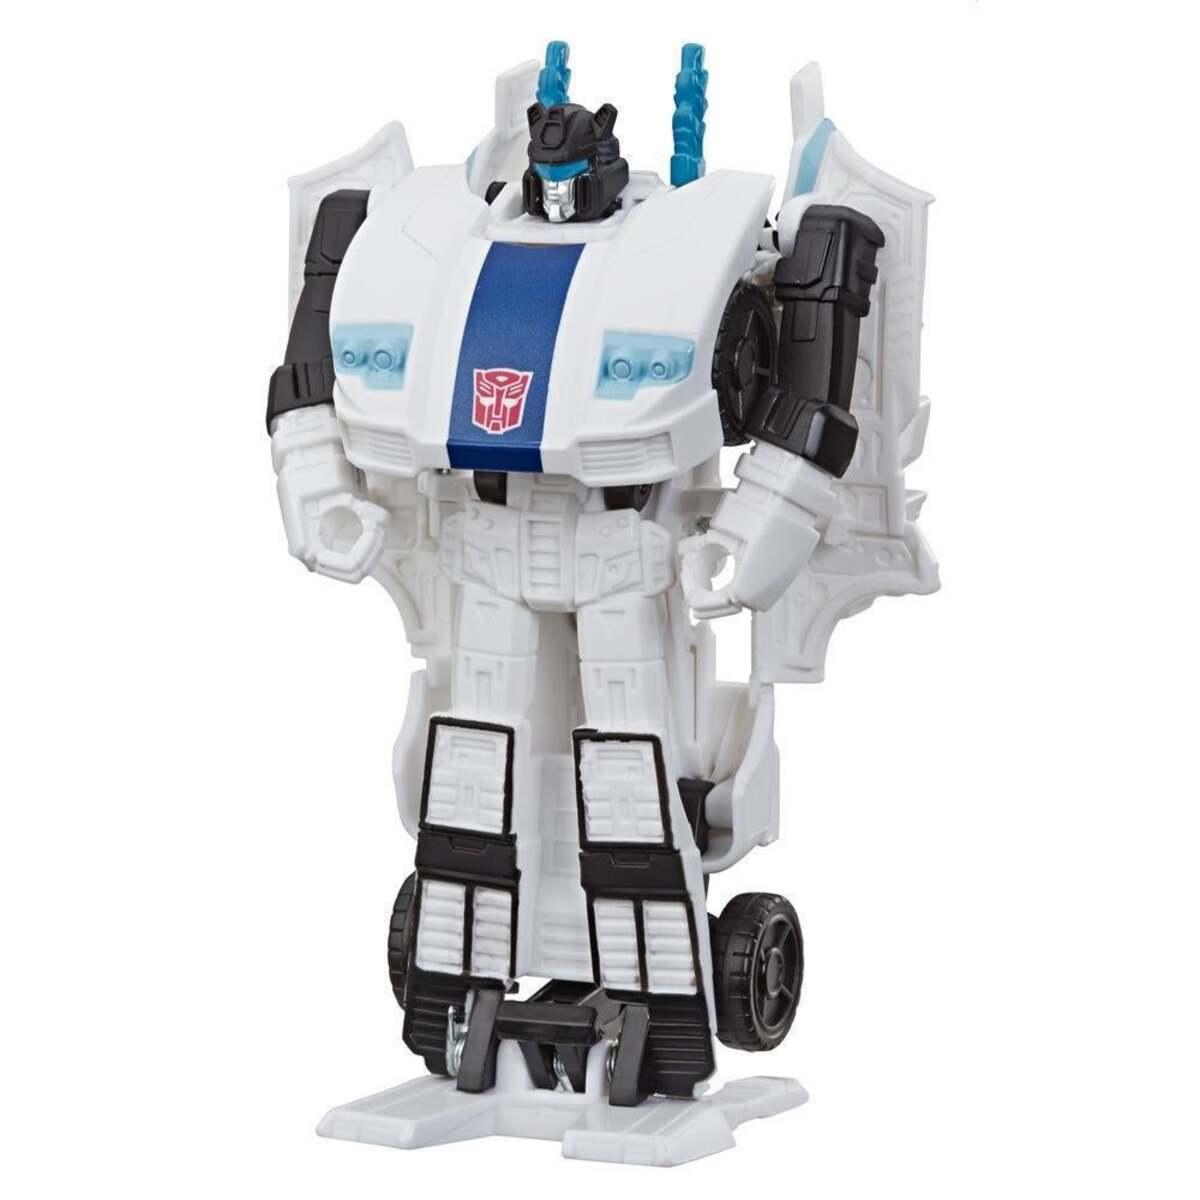 Bild 2 von Hasbro Transformers Cyberverse Action Attackers: 1-Step